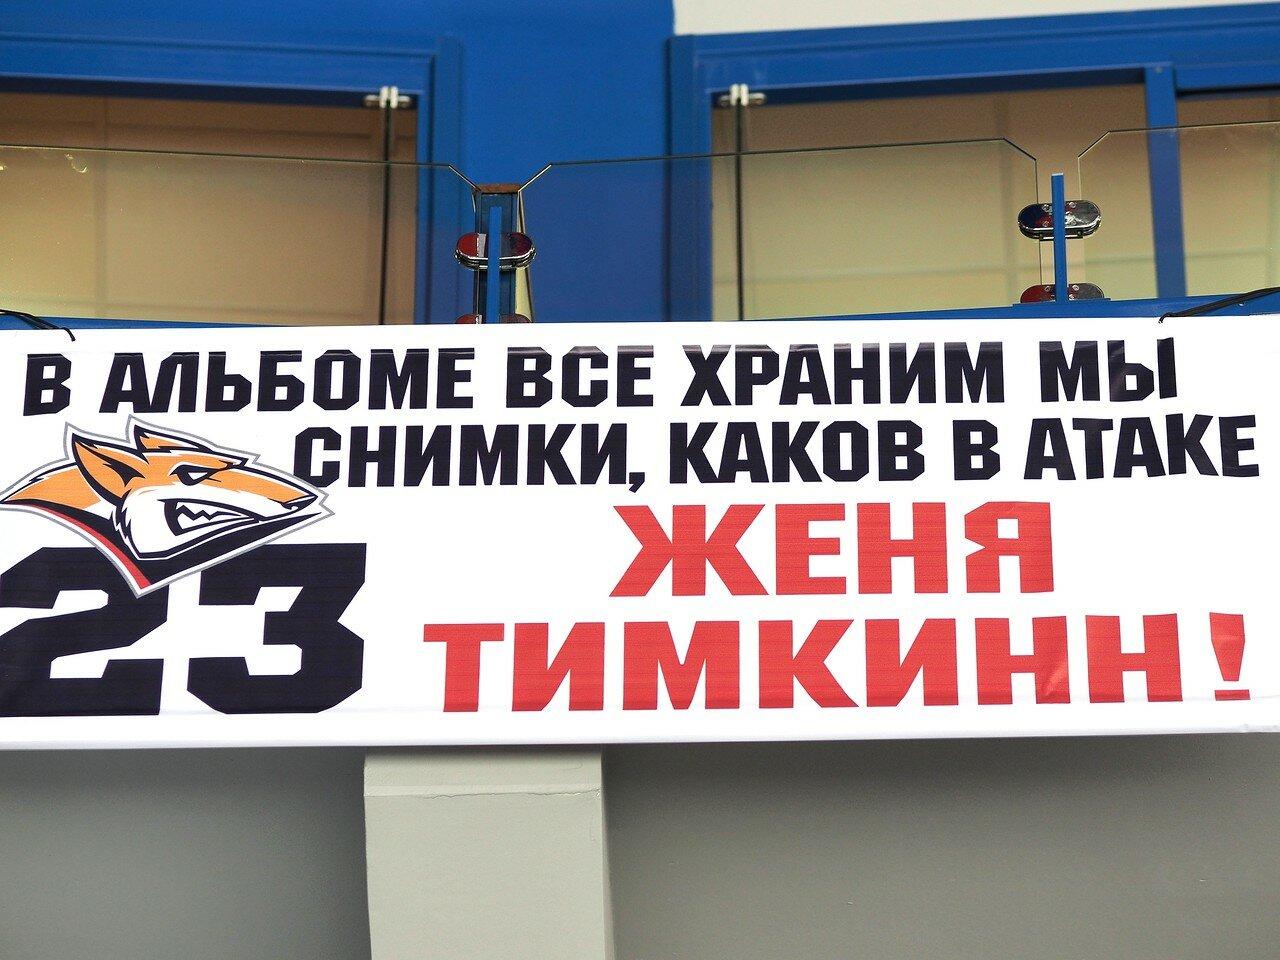 160Восток 1/2 плей-офф Металлург - Сибирь 08.03.2016